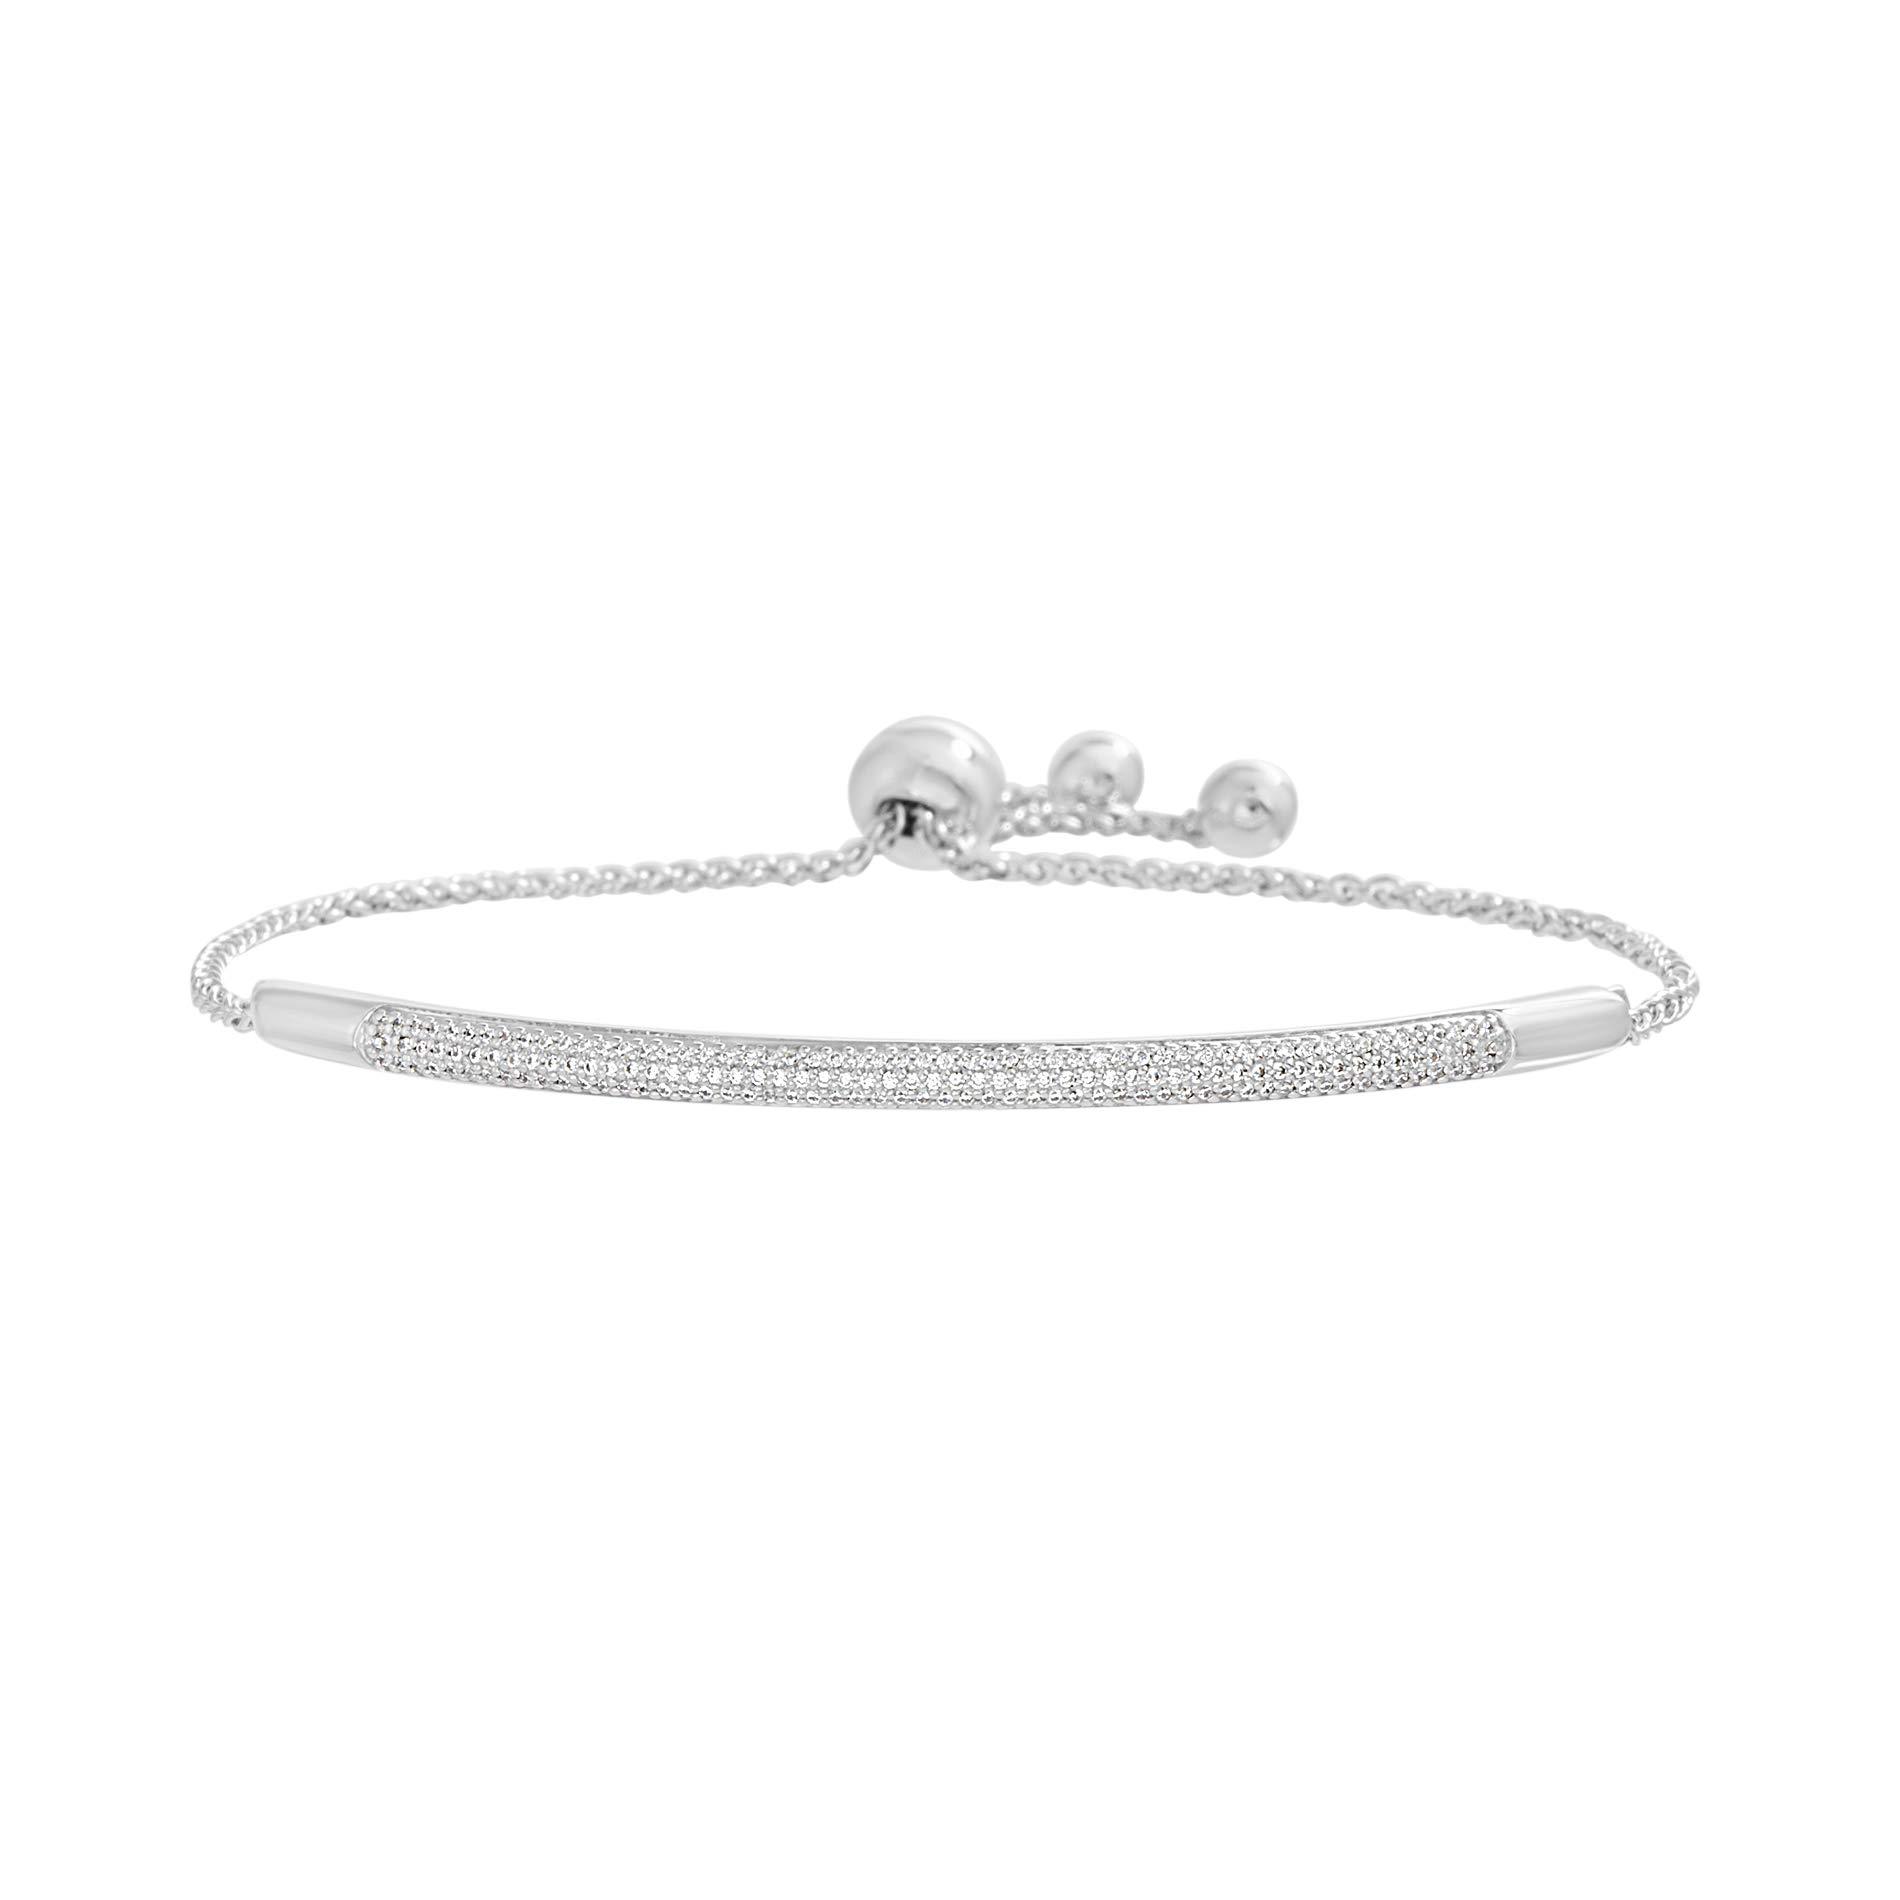 Devin Rose Rhodium Plated Sterling Silver 3/8 Cttw Diamond Bar Adjustable 6-8'' Slider Bolo Bracelet for Women by Devin Rose